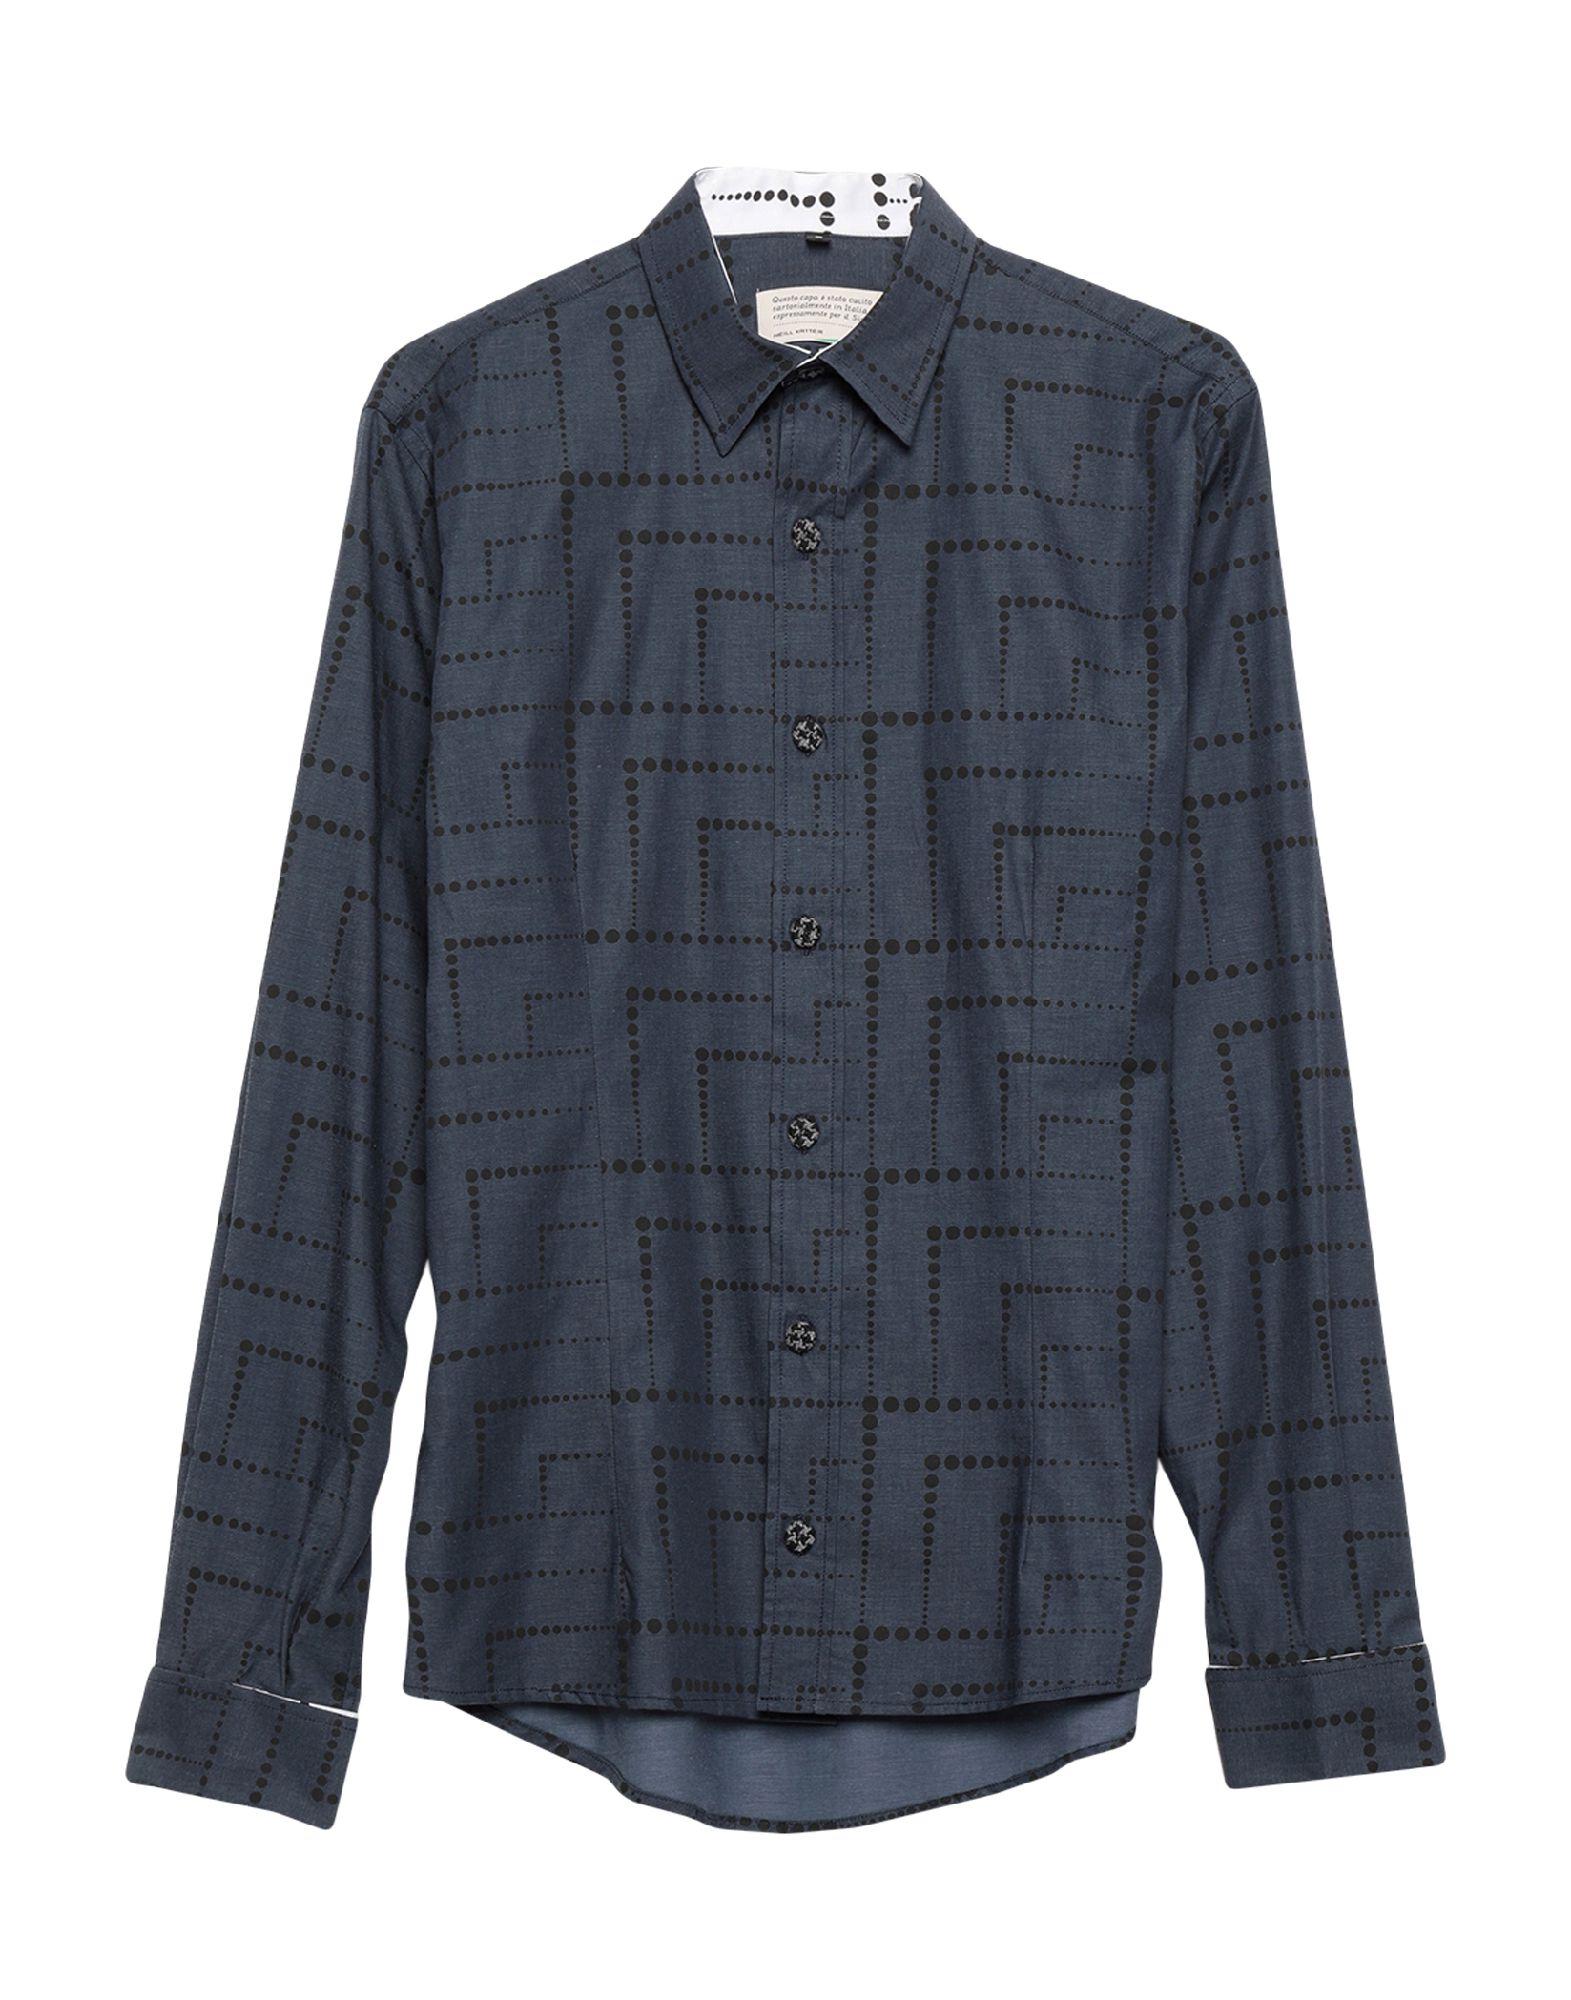 NEILL KATTER Shirts - Item 38941525